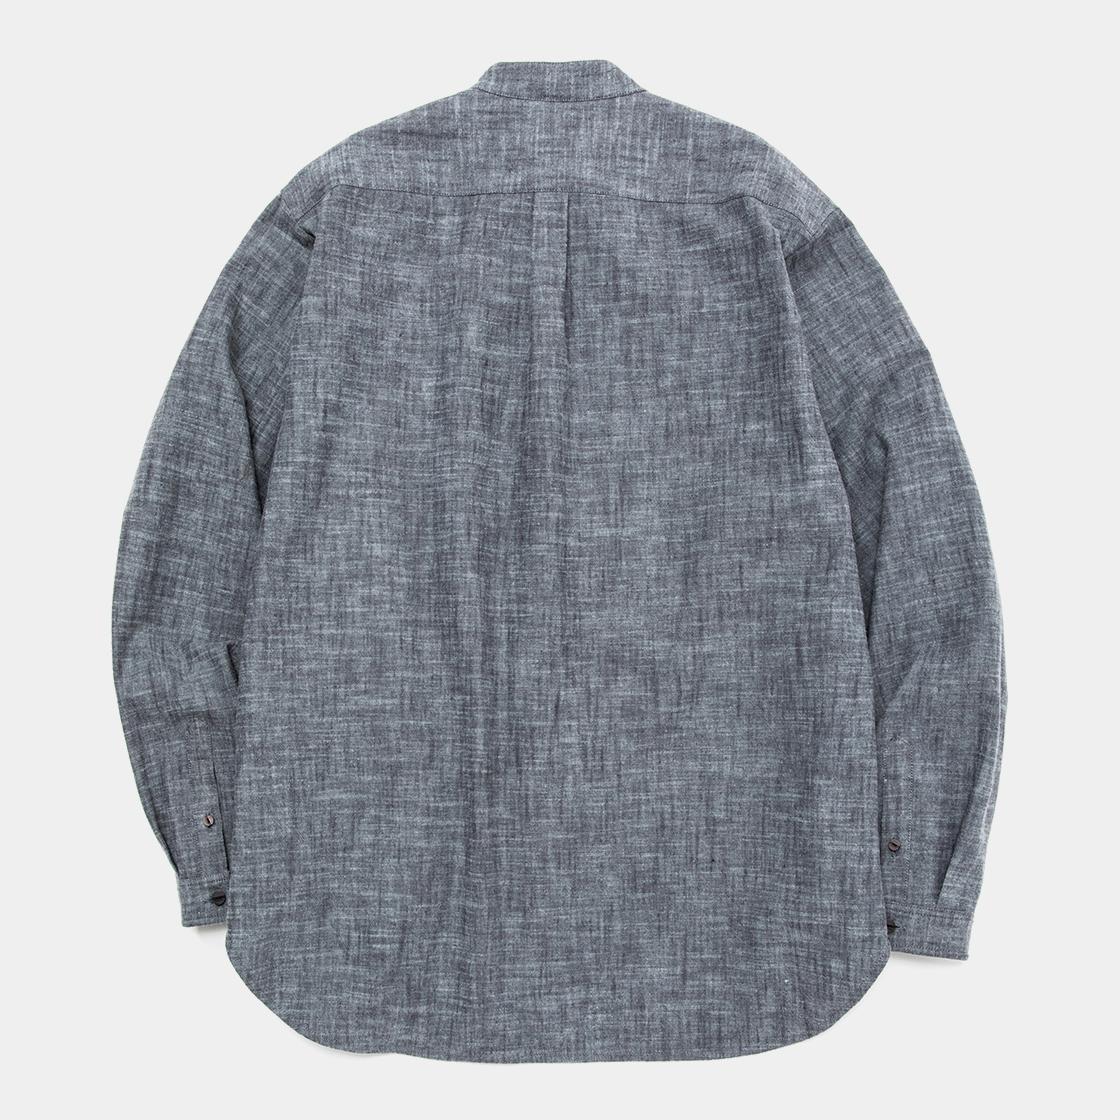 Blur Flannel SH / Cloud